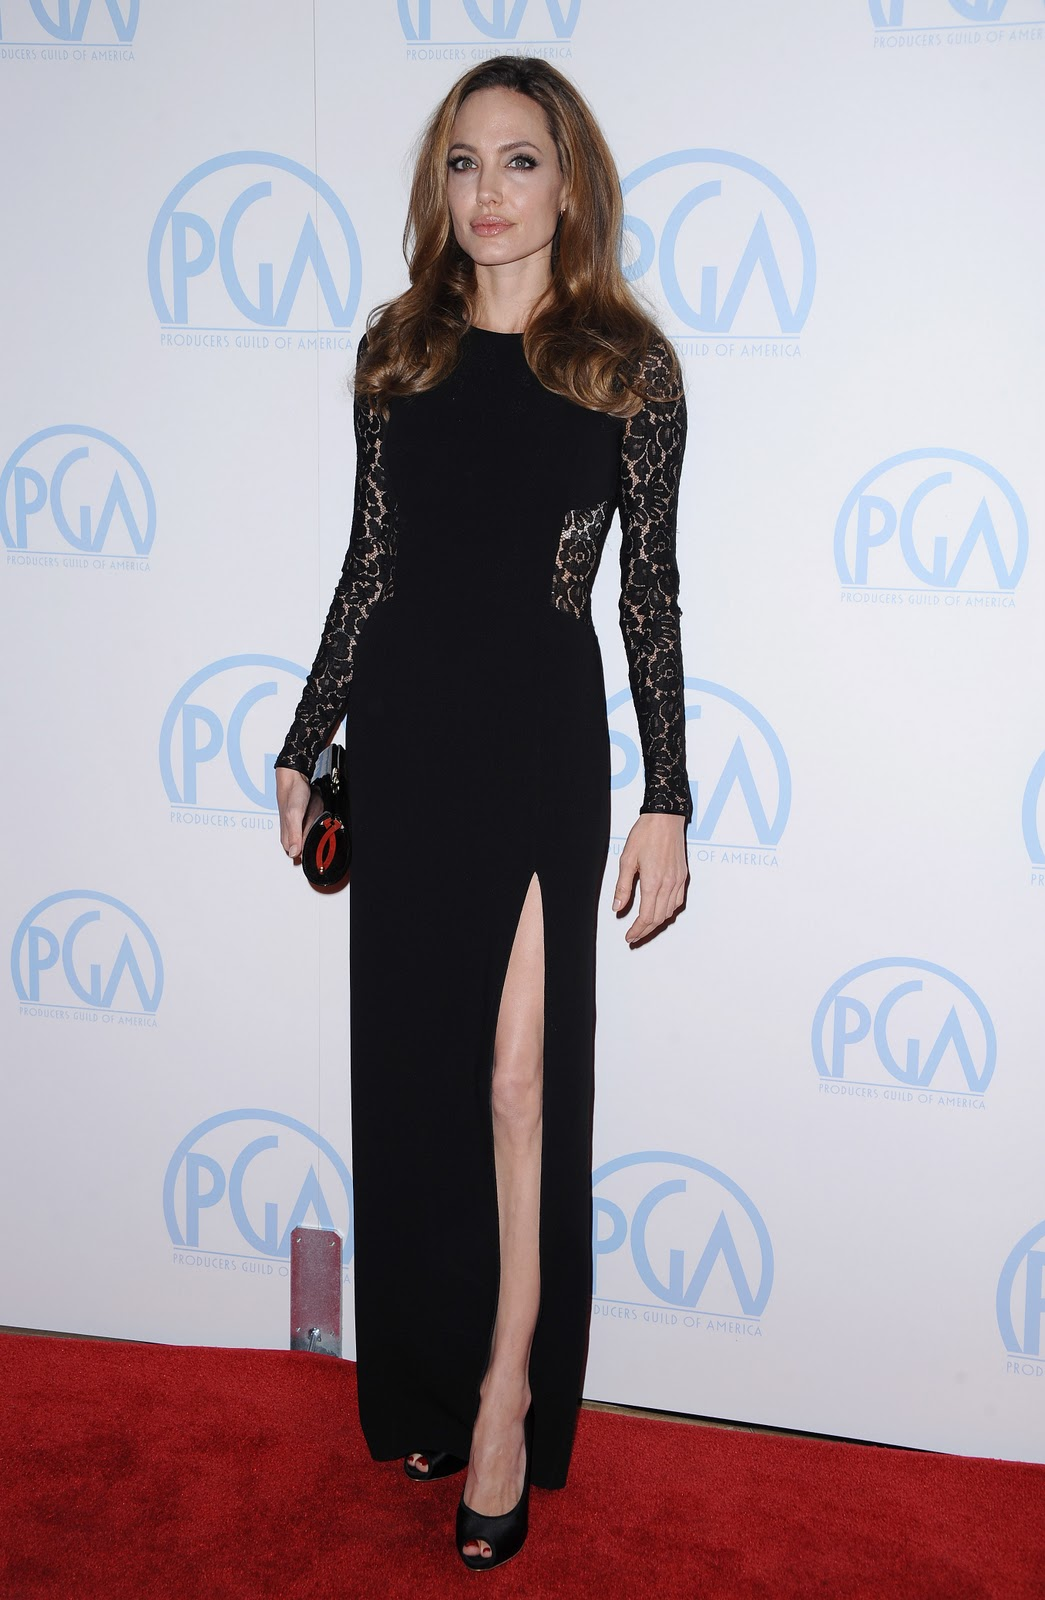 http://2.bp.blogspot.com/-ghOKJ-84UAw/TxweqnNjTZI/AAAAAAAAOfE/5MHCPAznugA/s1600/20281_Angelina_Jolie_23rd_Producers_Guild_Awards_J0001_042_122_364lo.jpg